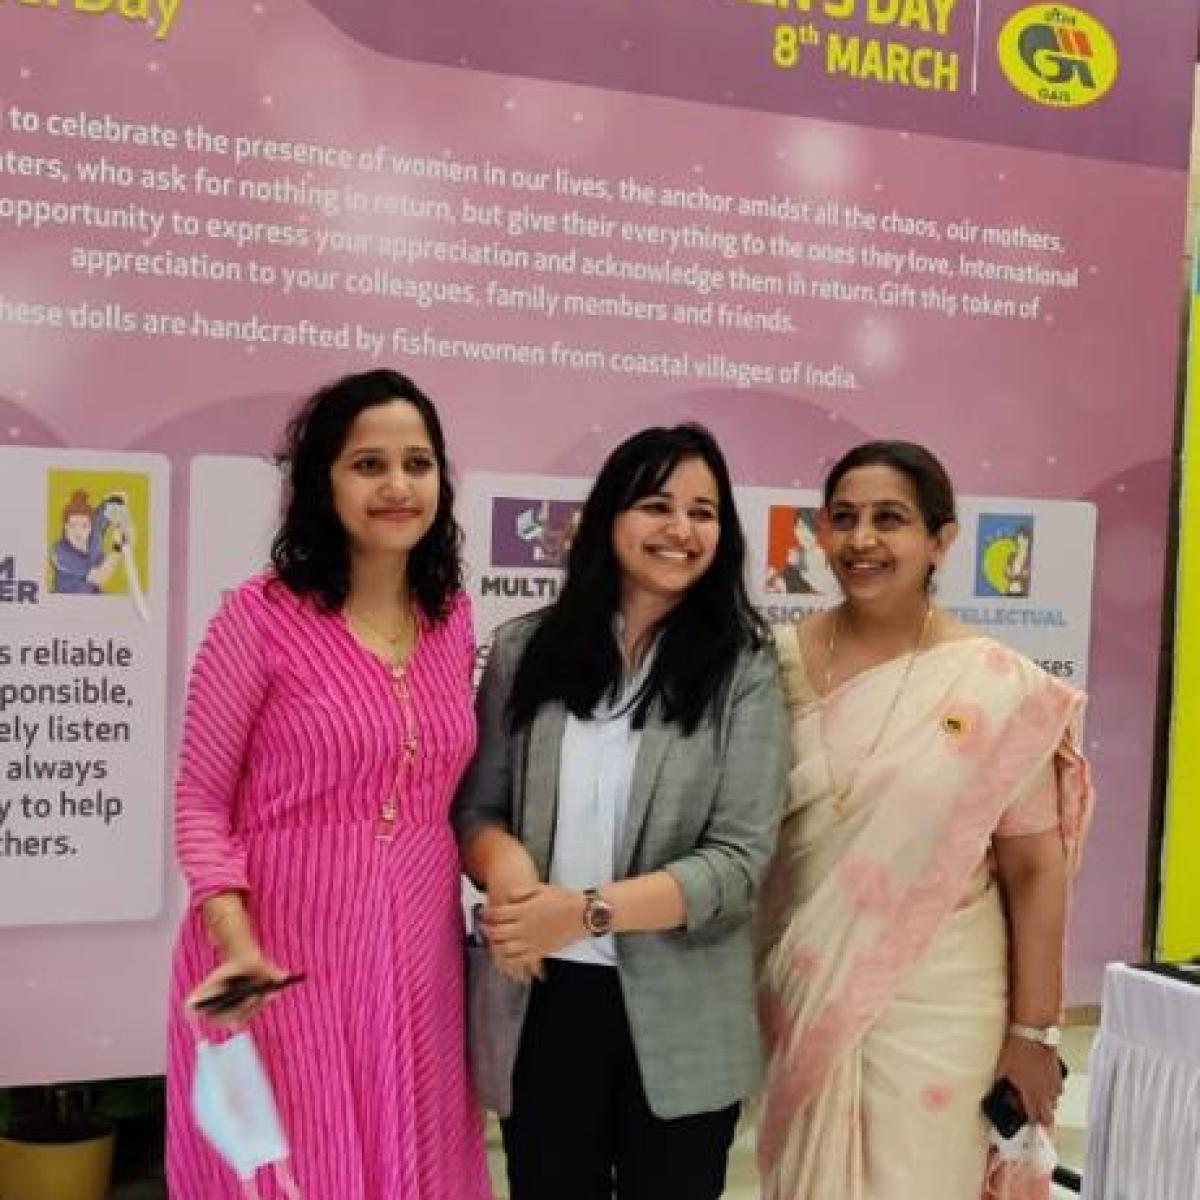 GAIL celebrates International Women's Day